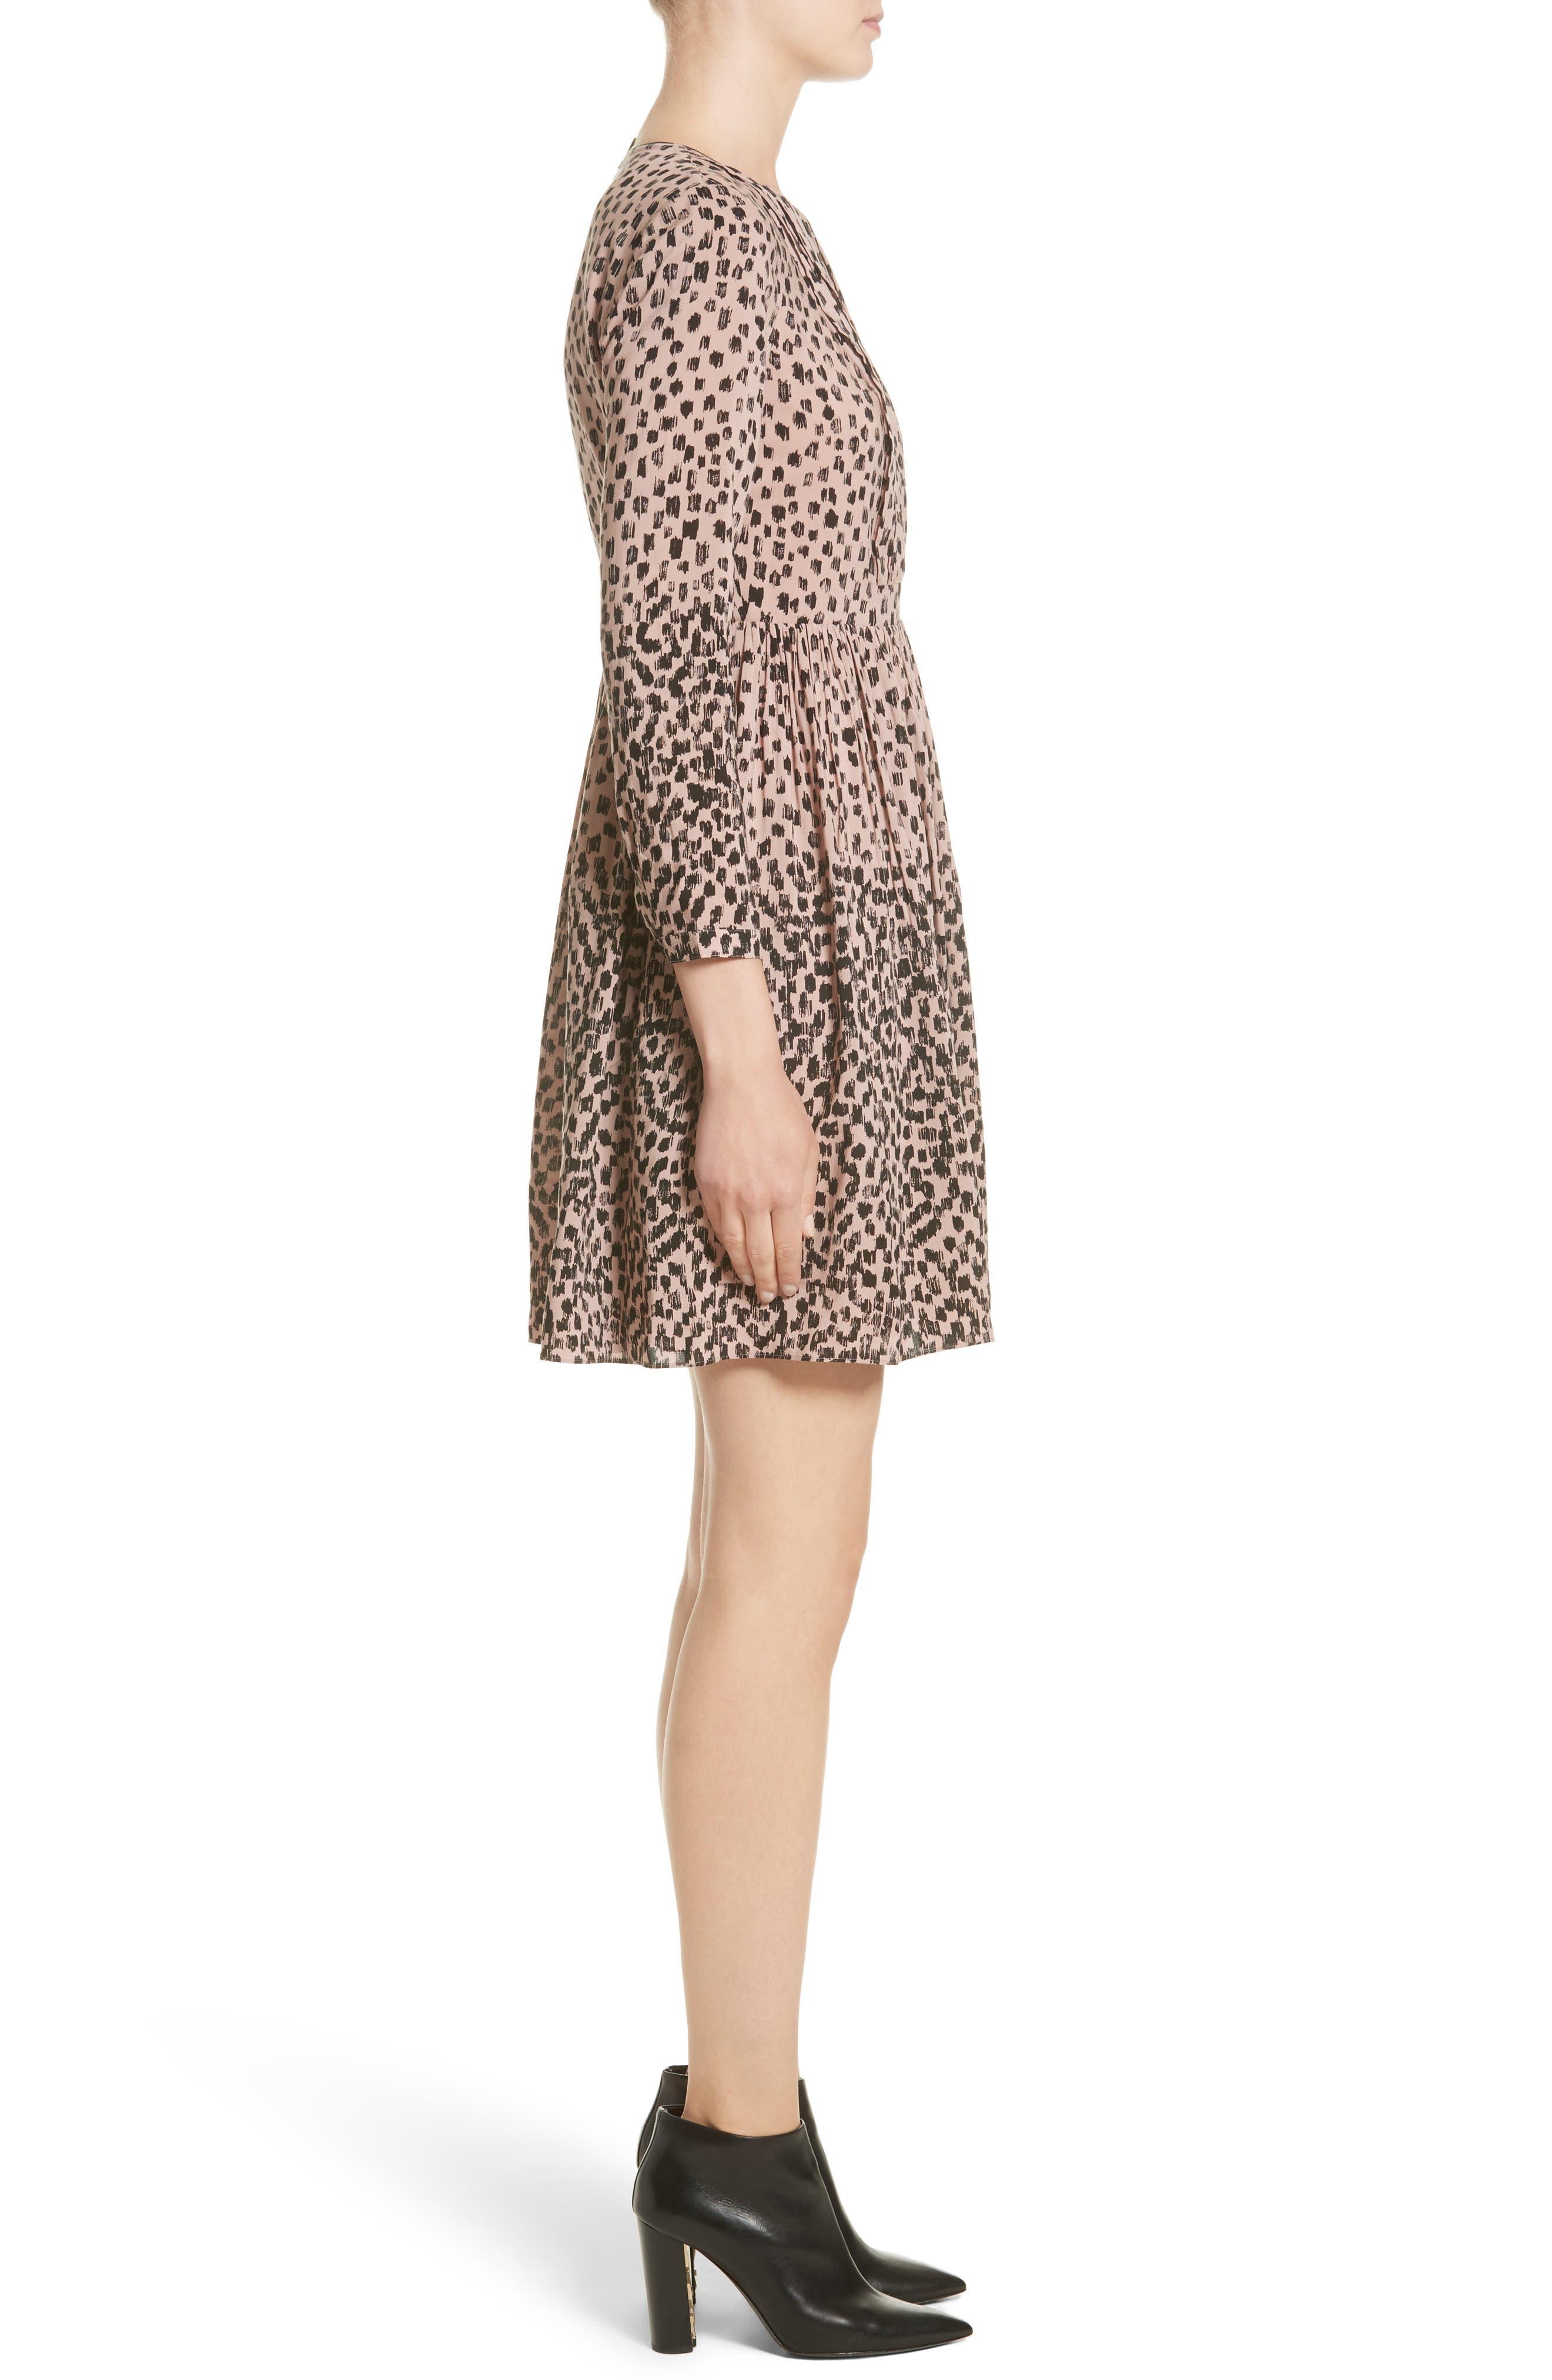 Karinkalt Leather Trim Print Dress,                             Alternate thumbnail 3, color,                             683